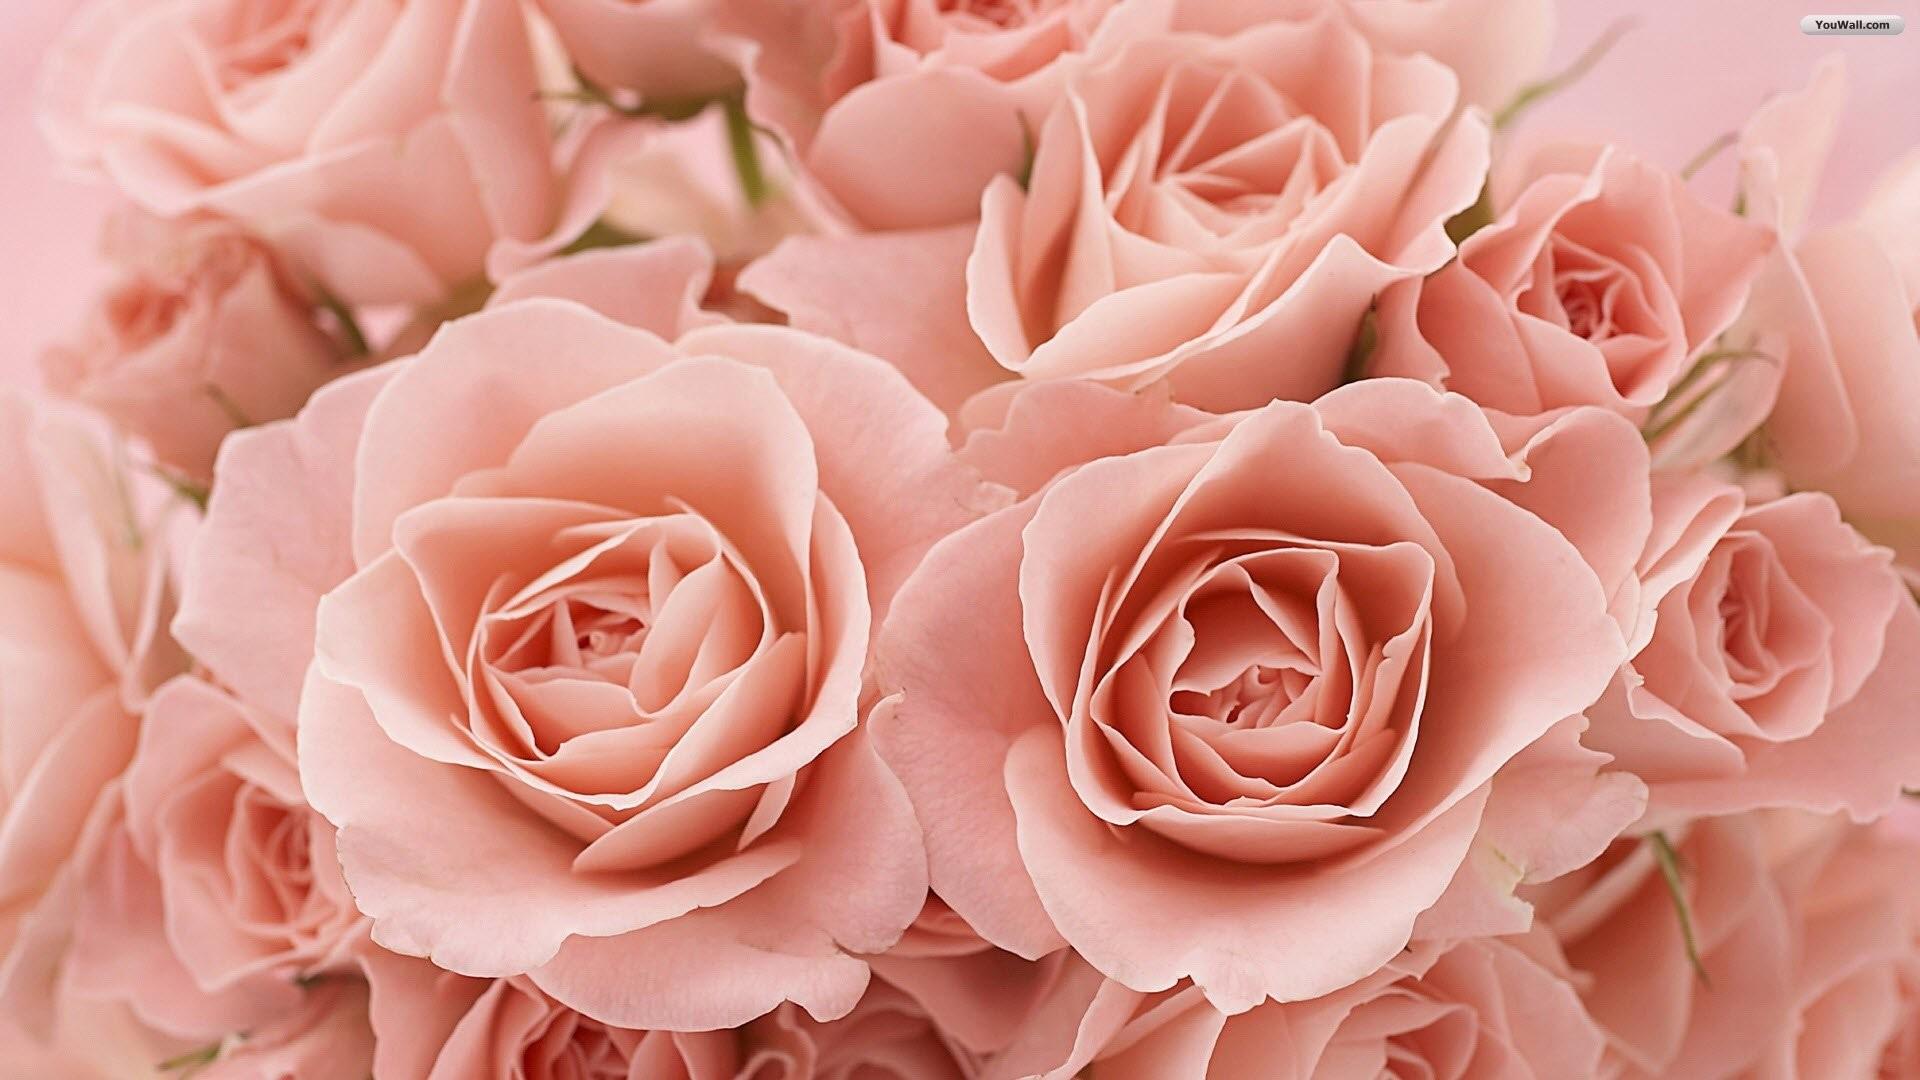 Rose Desktop Wallpapers 52 Pictures